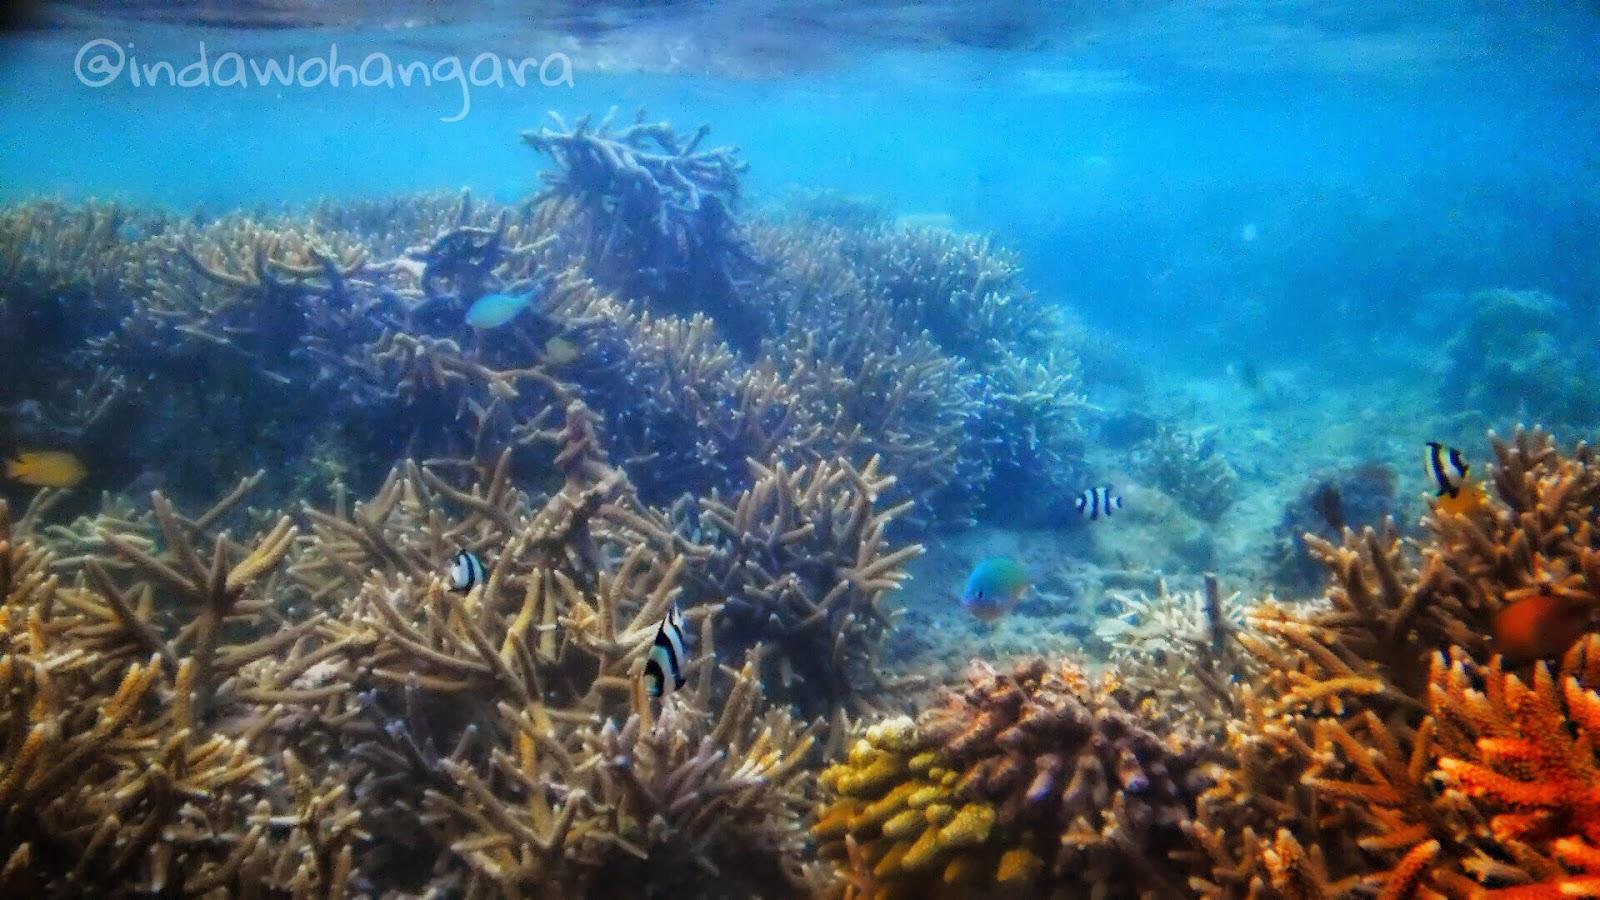 Inda Tapaleuk Bawah Laut Kupang Pantai Koepan Kab